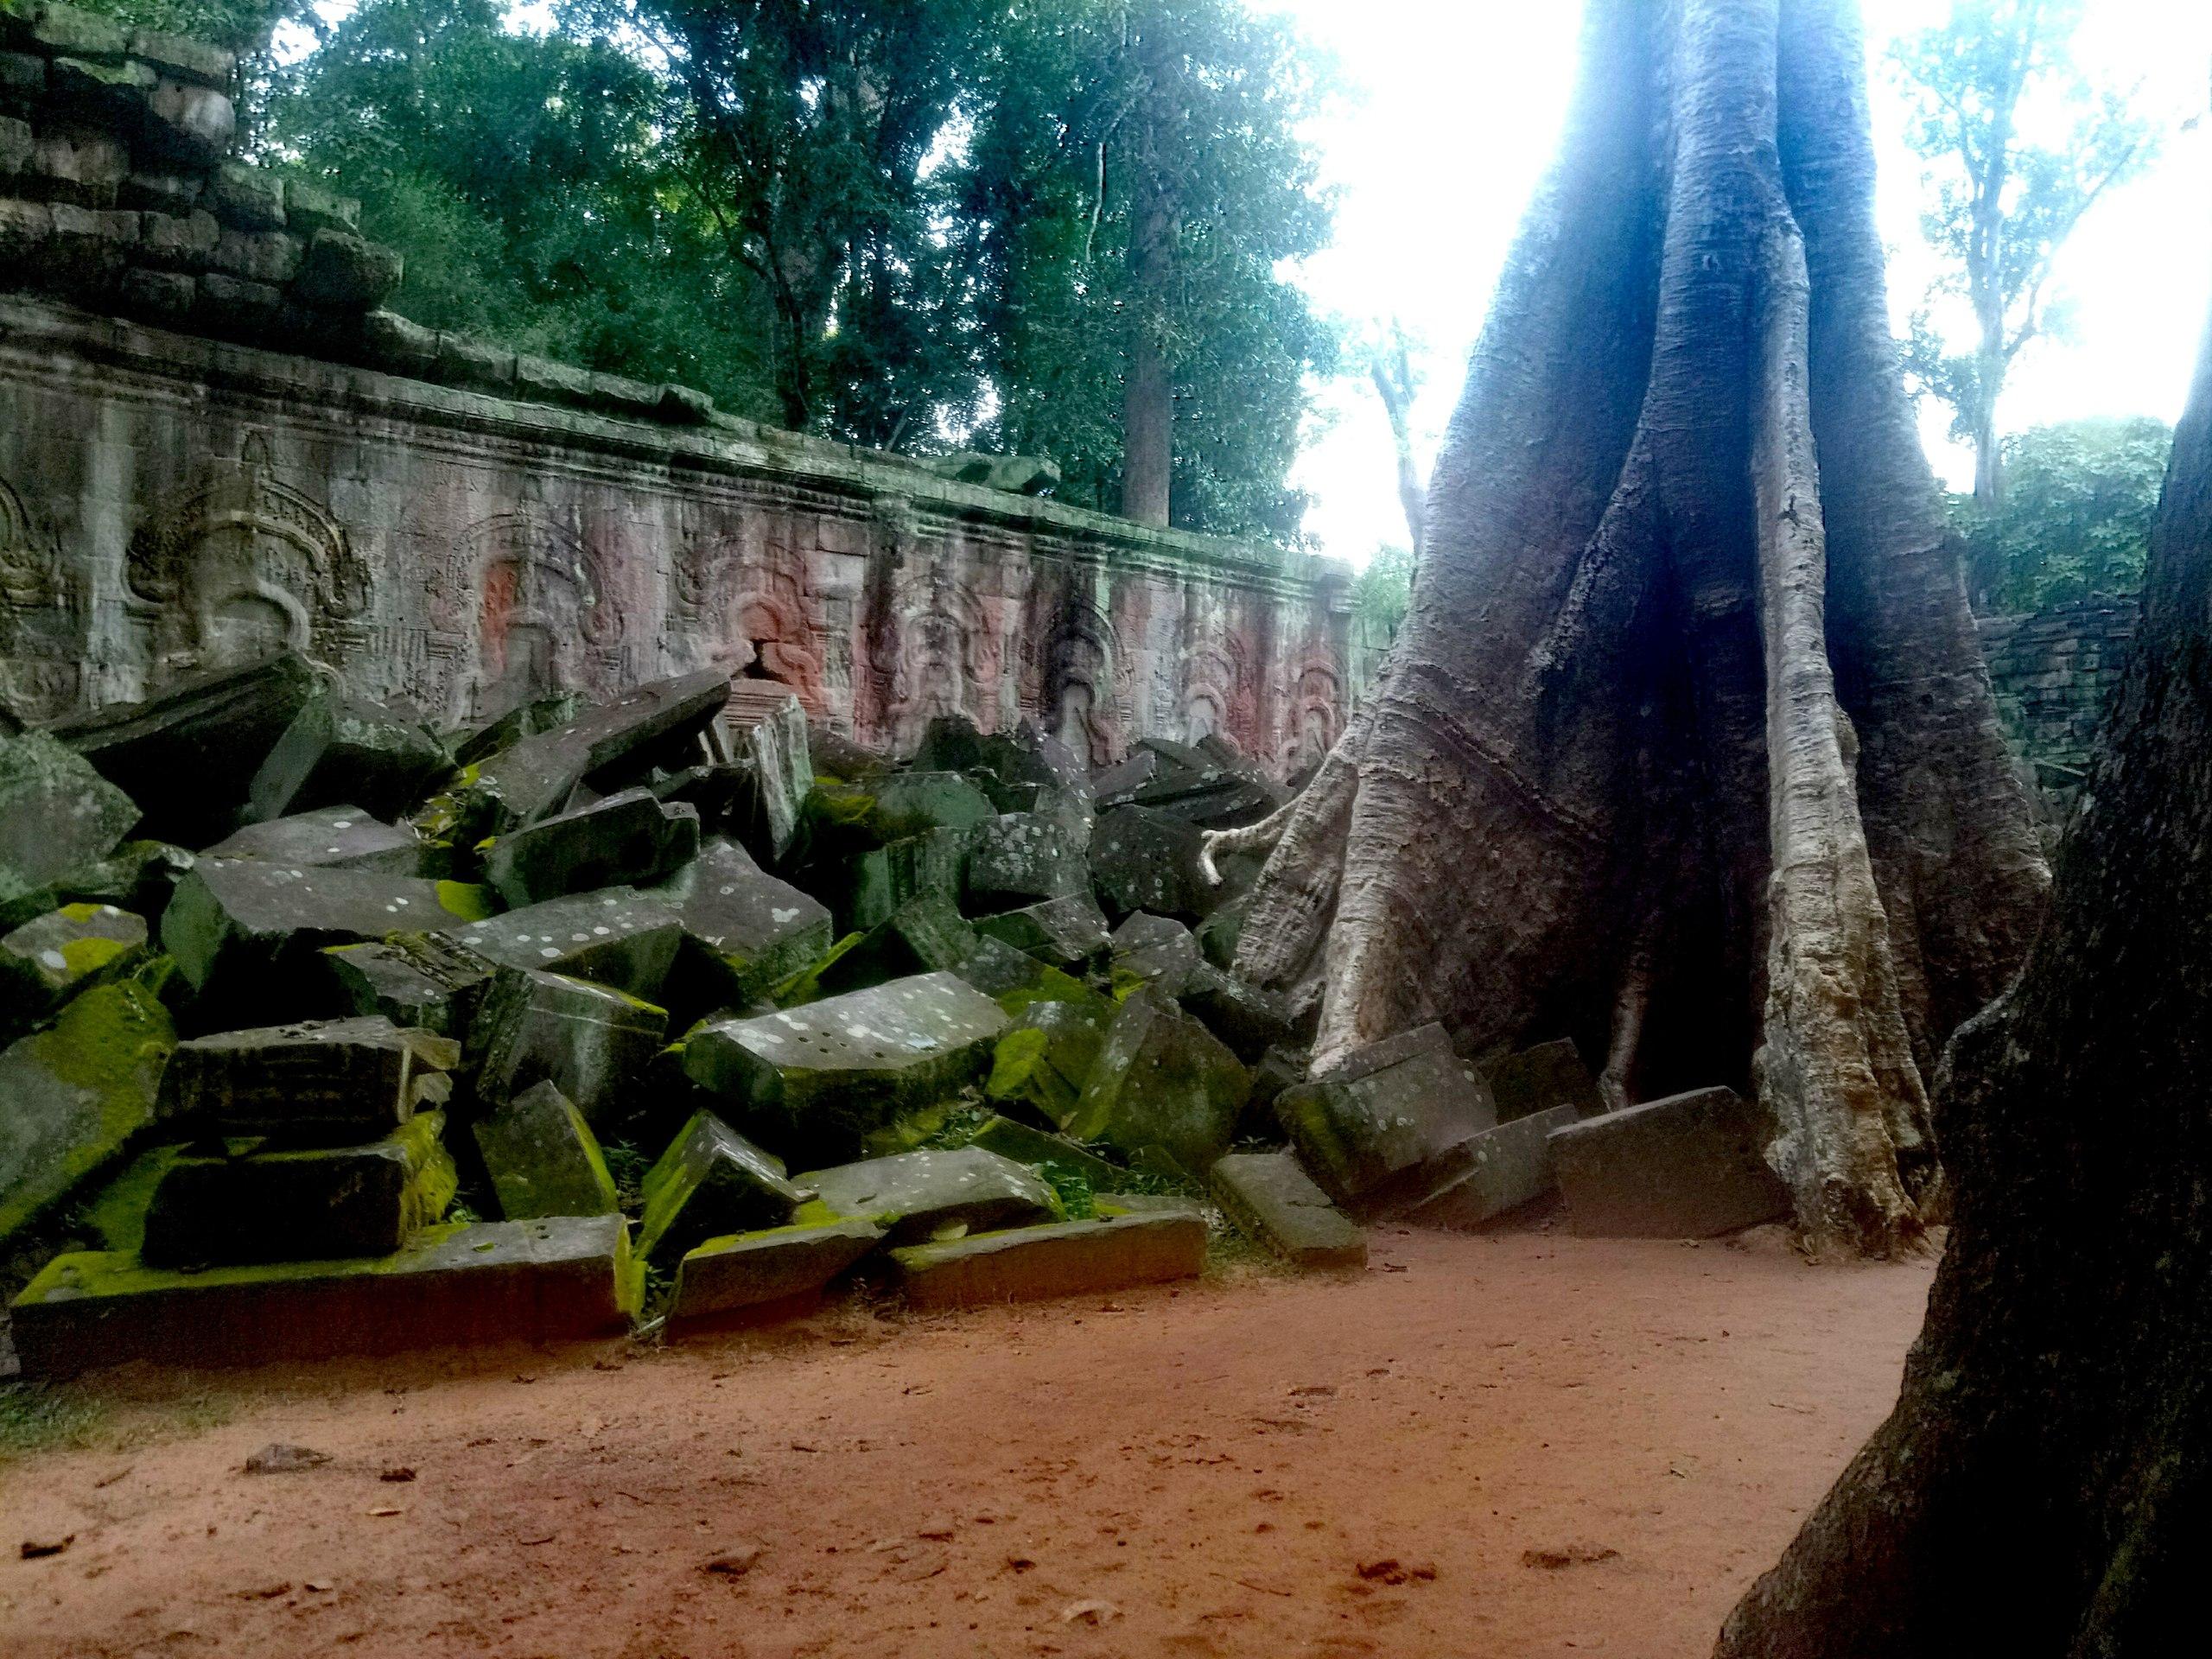 Елена Руденко (Валтея). Камбоджа. Ангкор. - Страница 3 6iyusmYXkp8